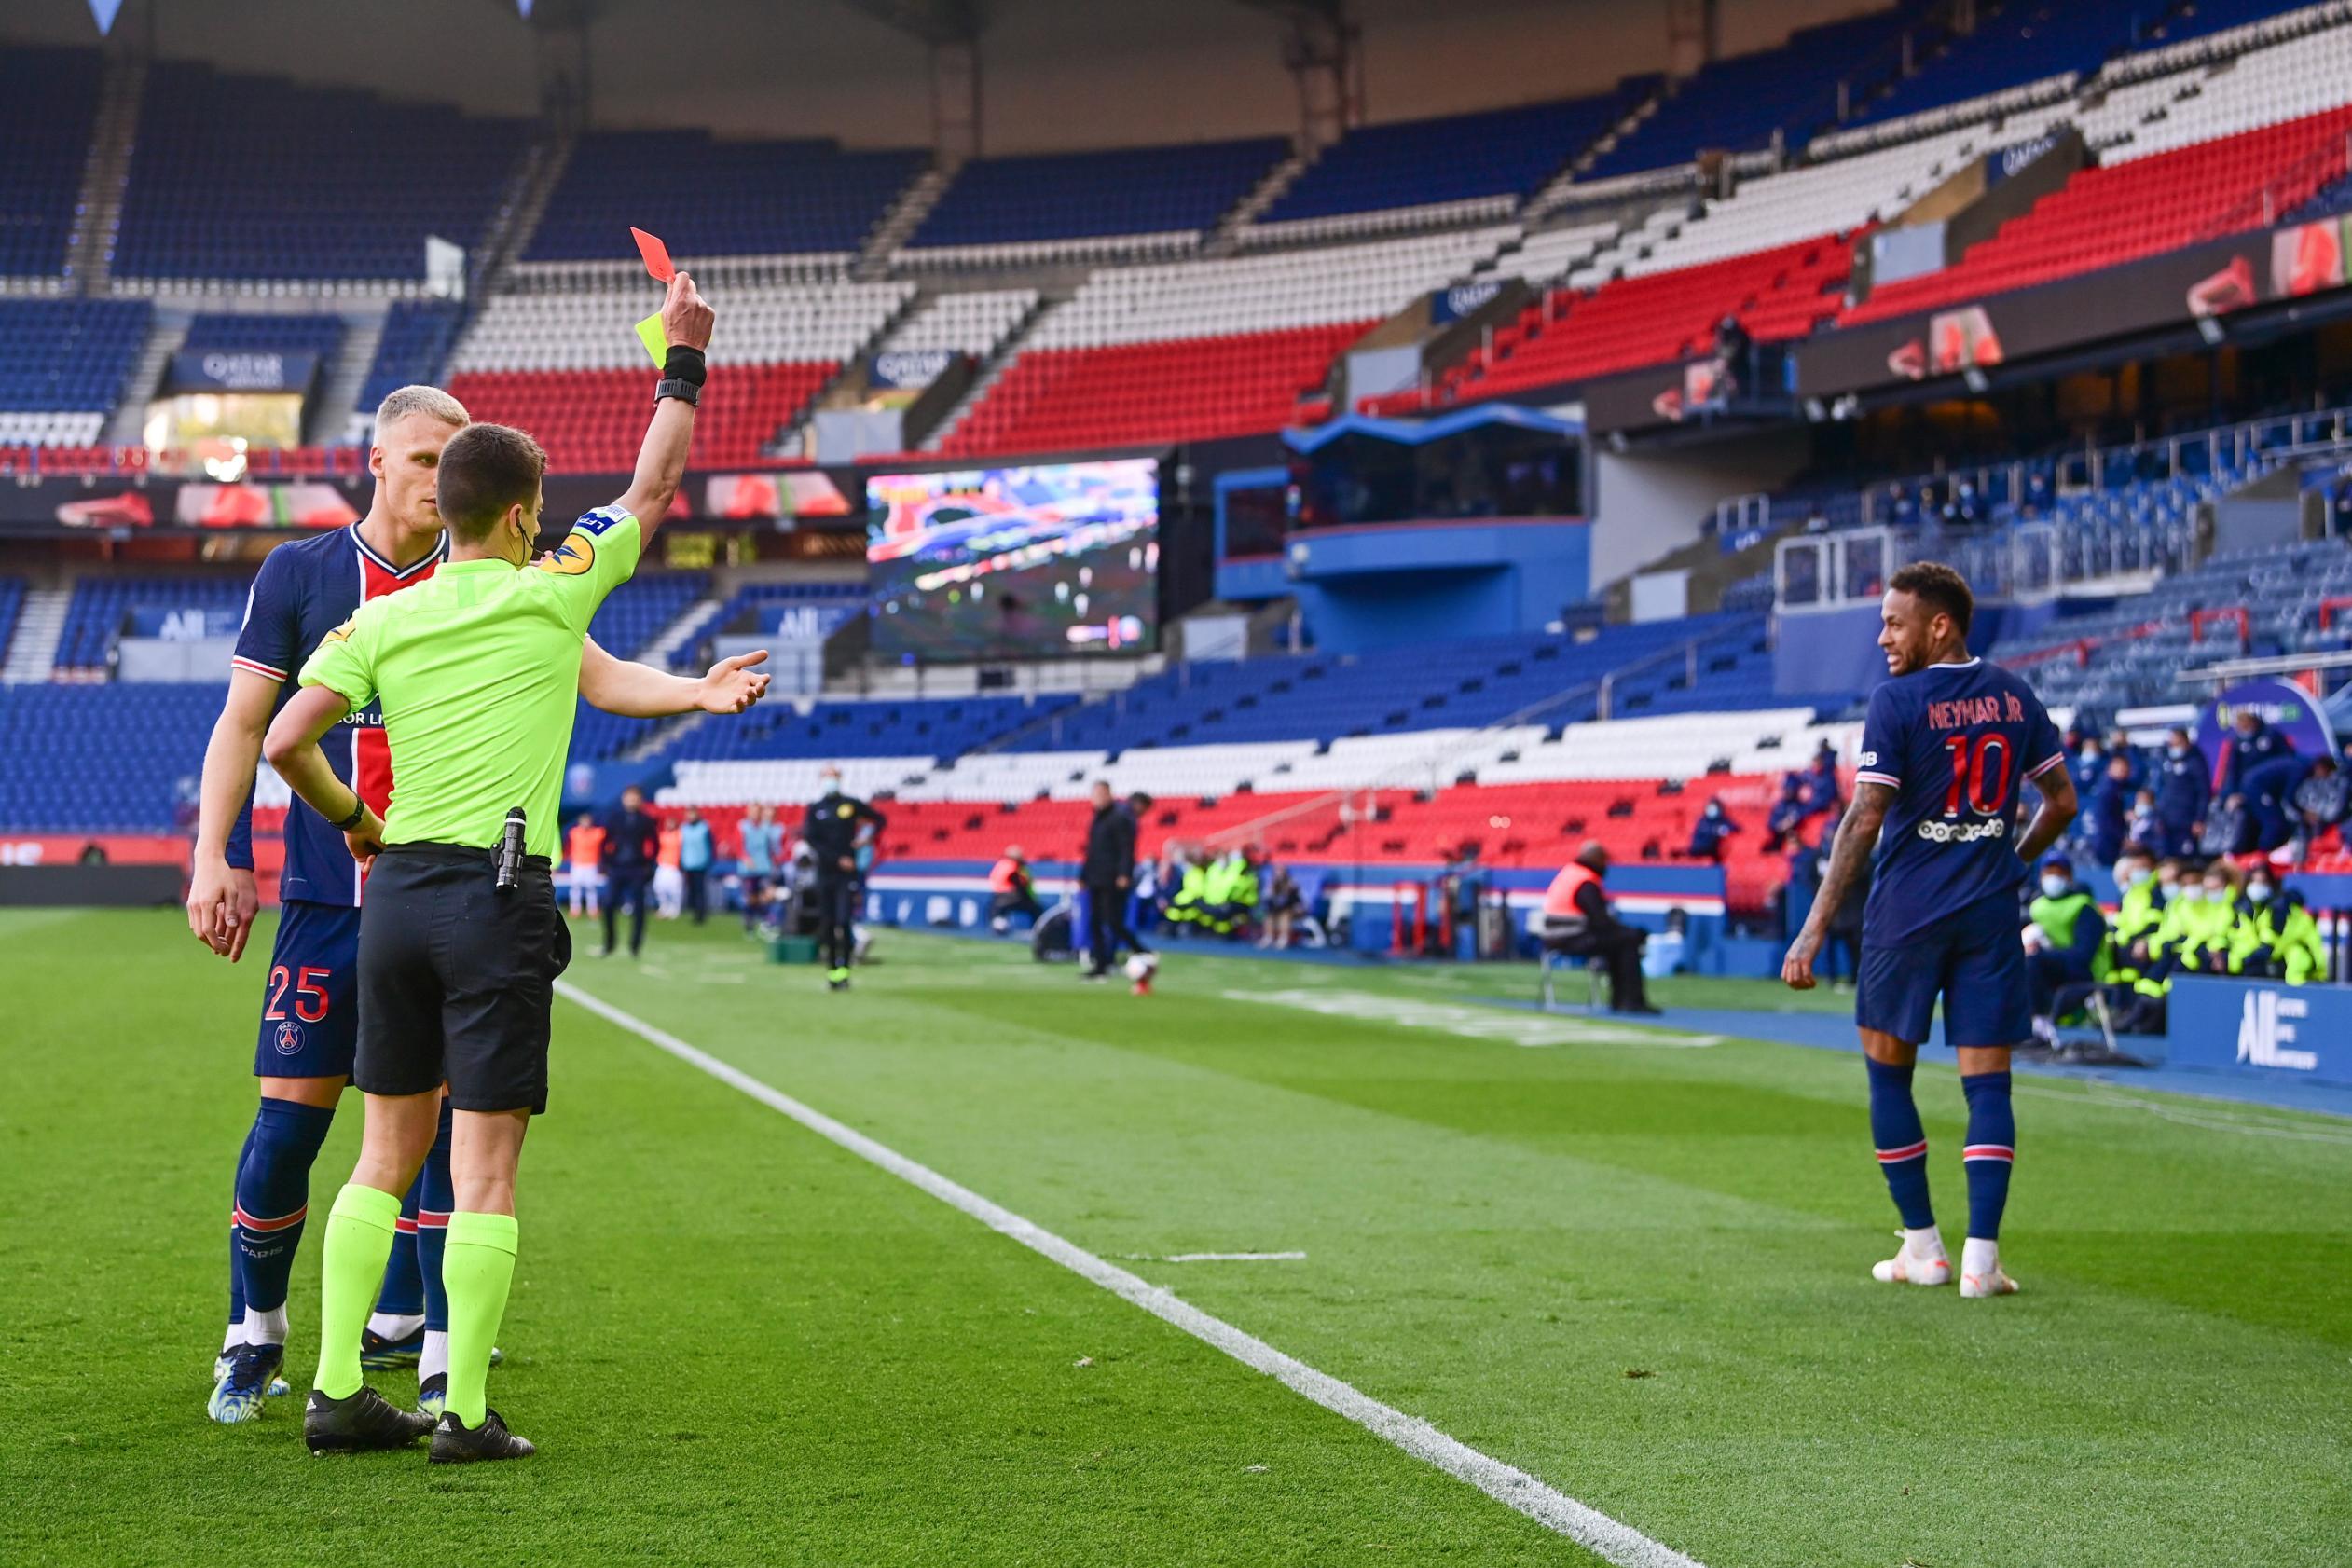 Neymar sees red as Lille stuns Paris Saint-Germain in Ligue 1 title showdown